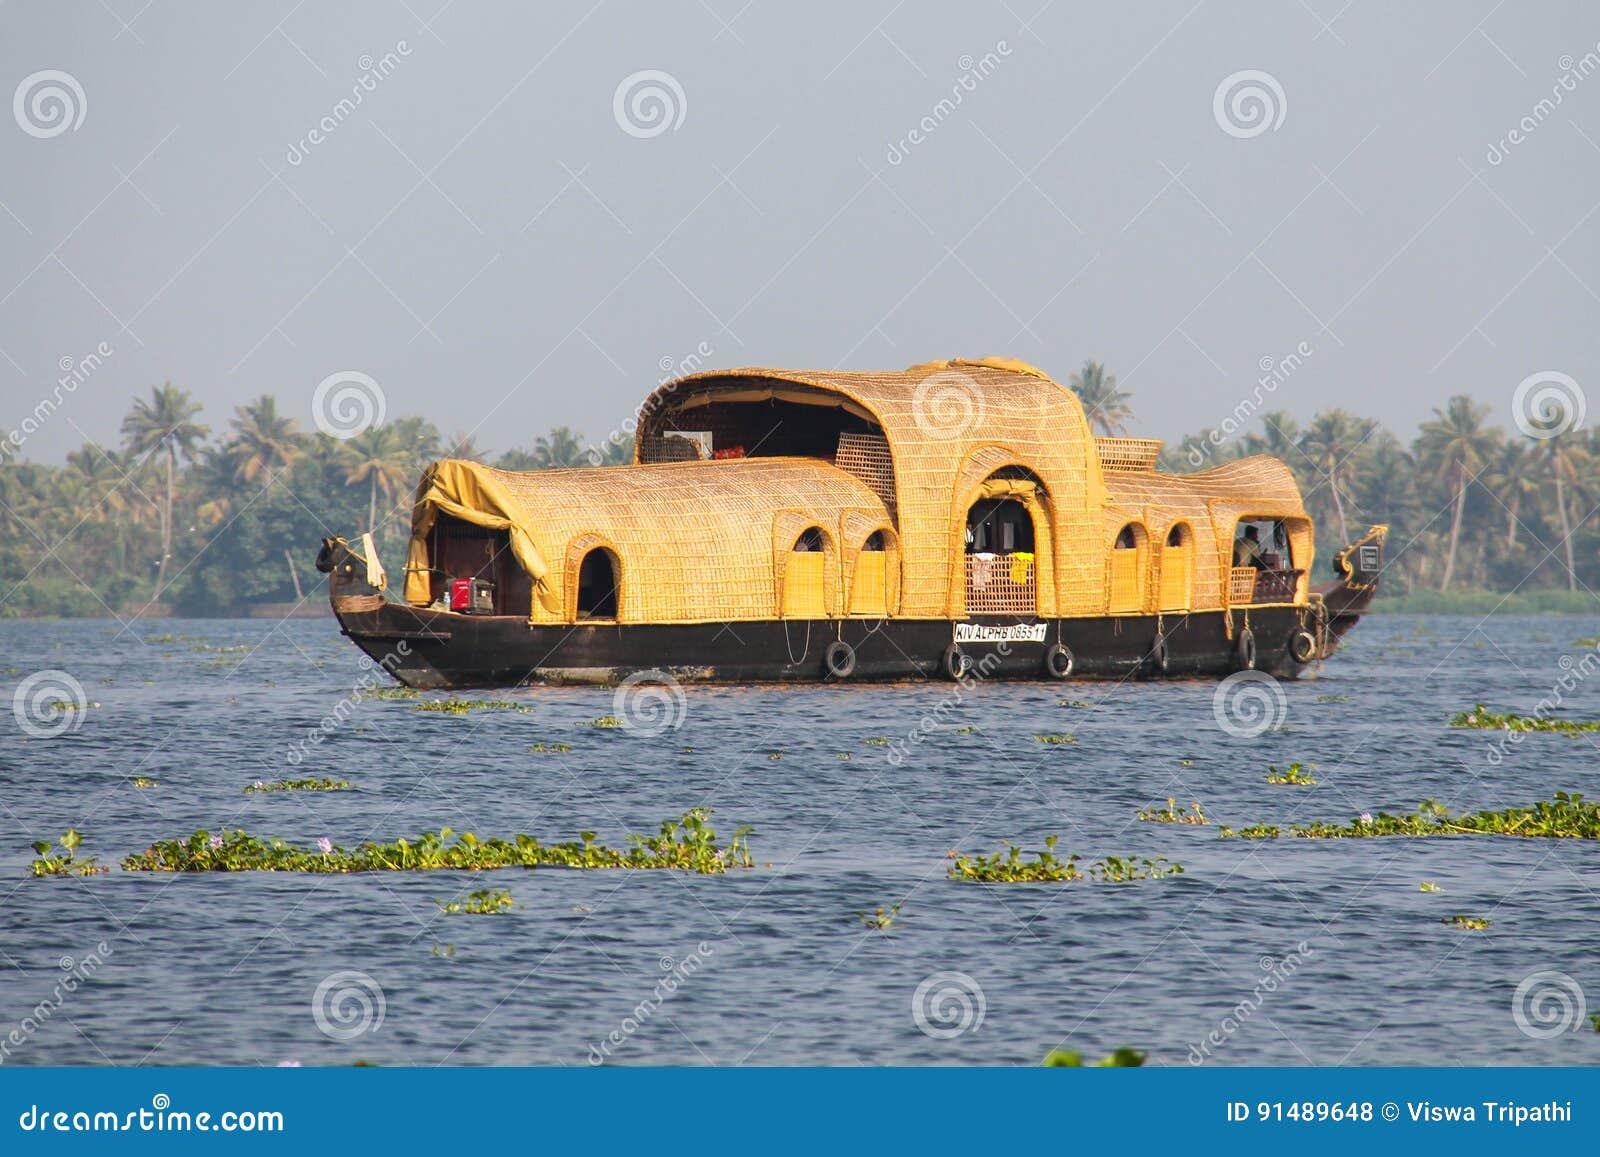 Casa de barco em Kumarakom, Kerala